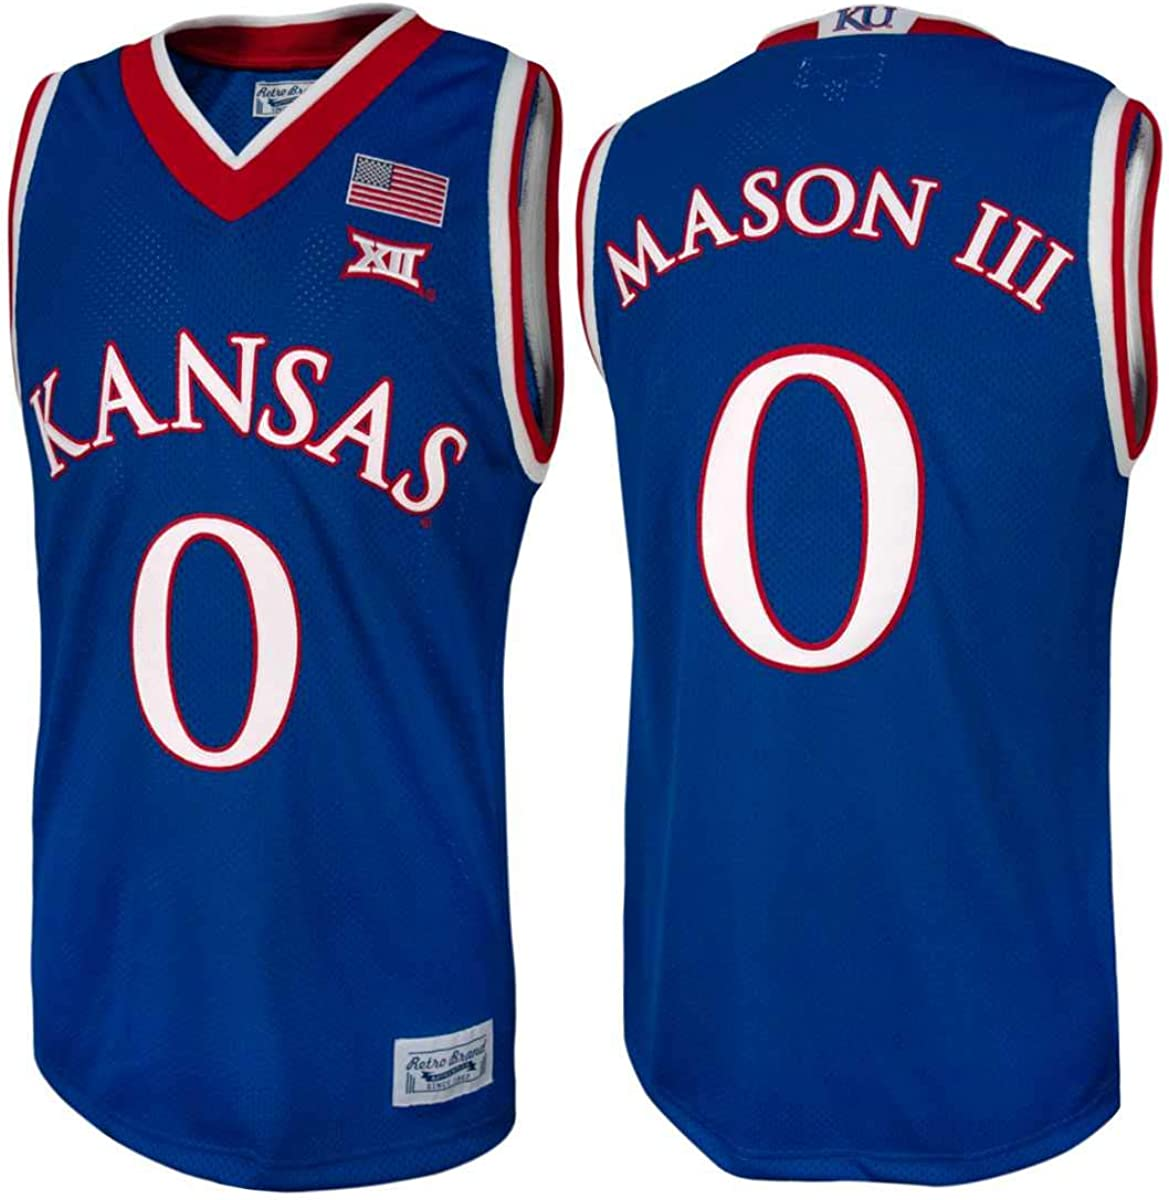 Frank Mason III #0 Retro Brand Authentic Basketball Blue Jersey